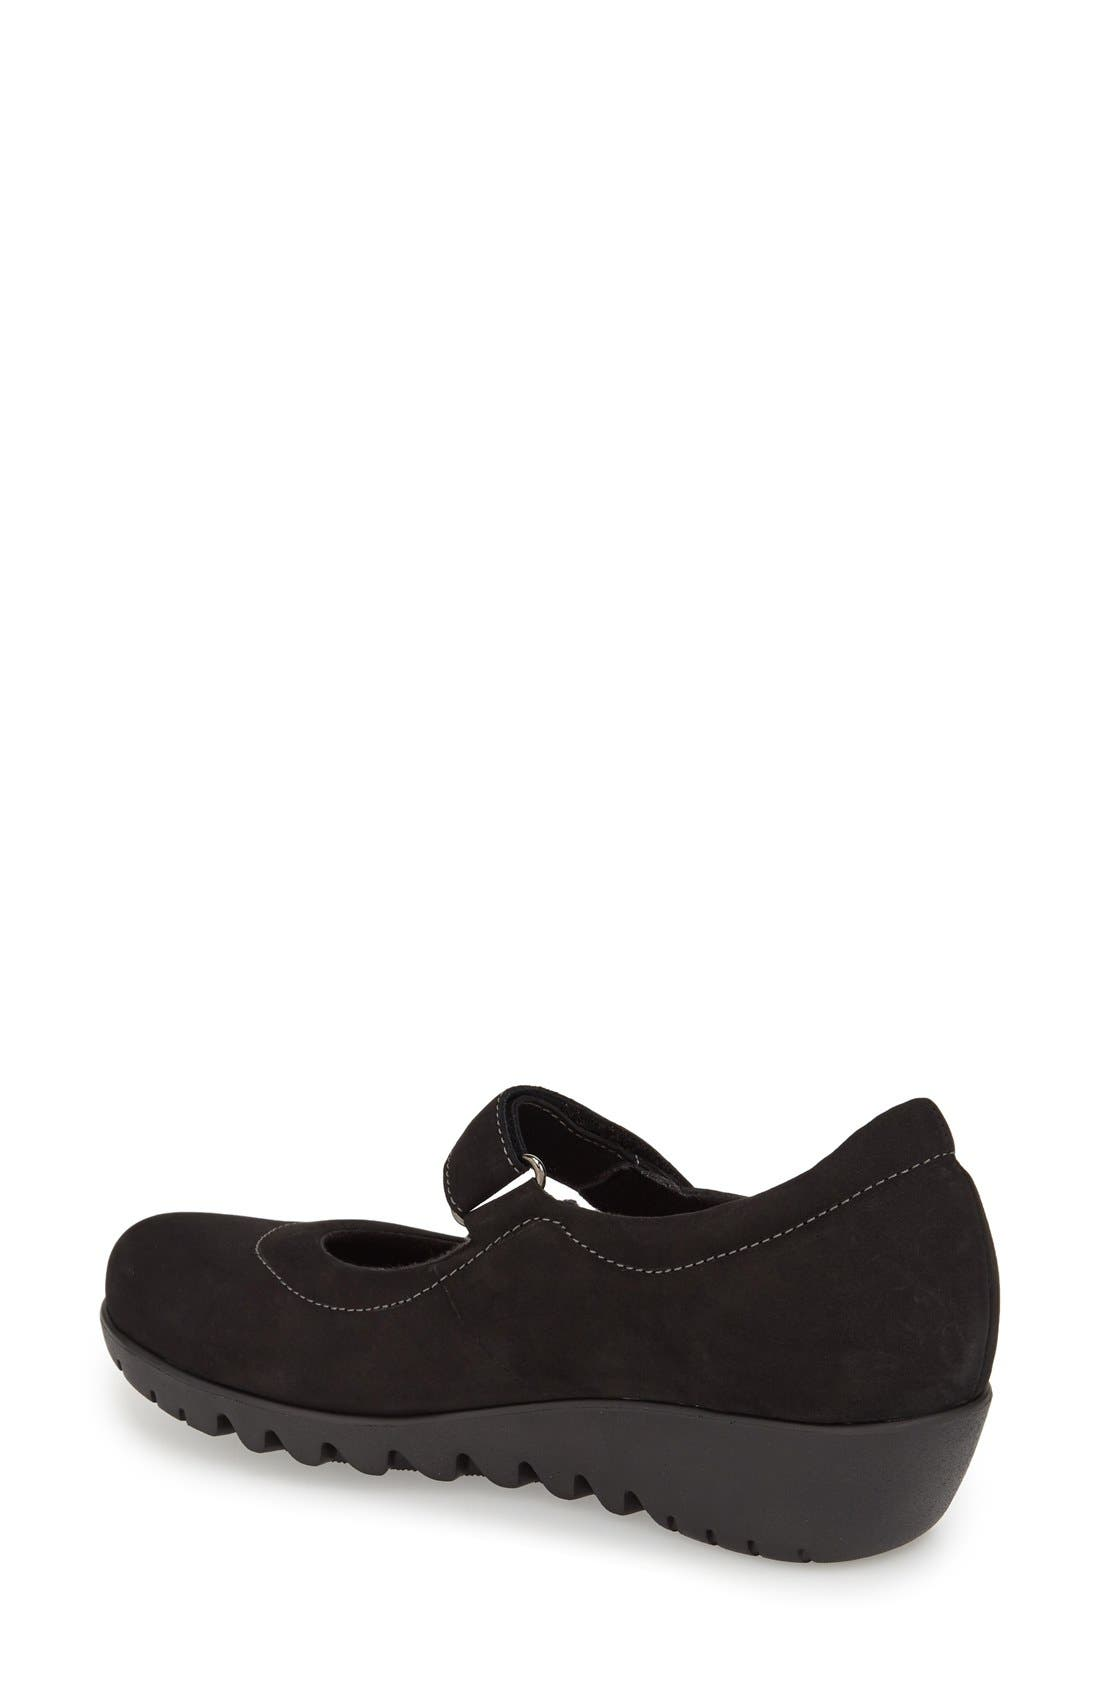 'Pia' Mary Jane,                             Alternate thumbnail 2, color,                             Black Nubuck Leather